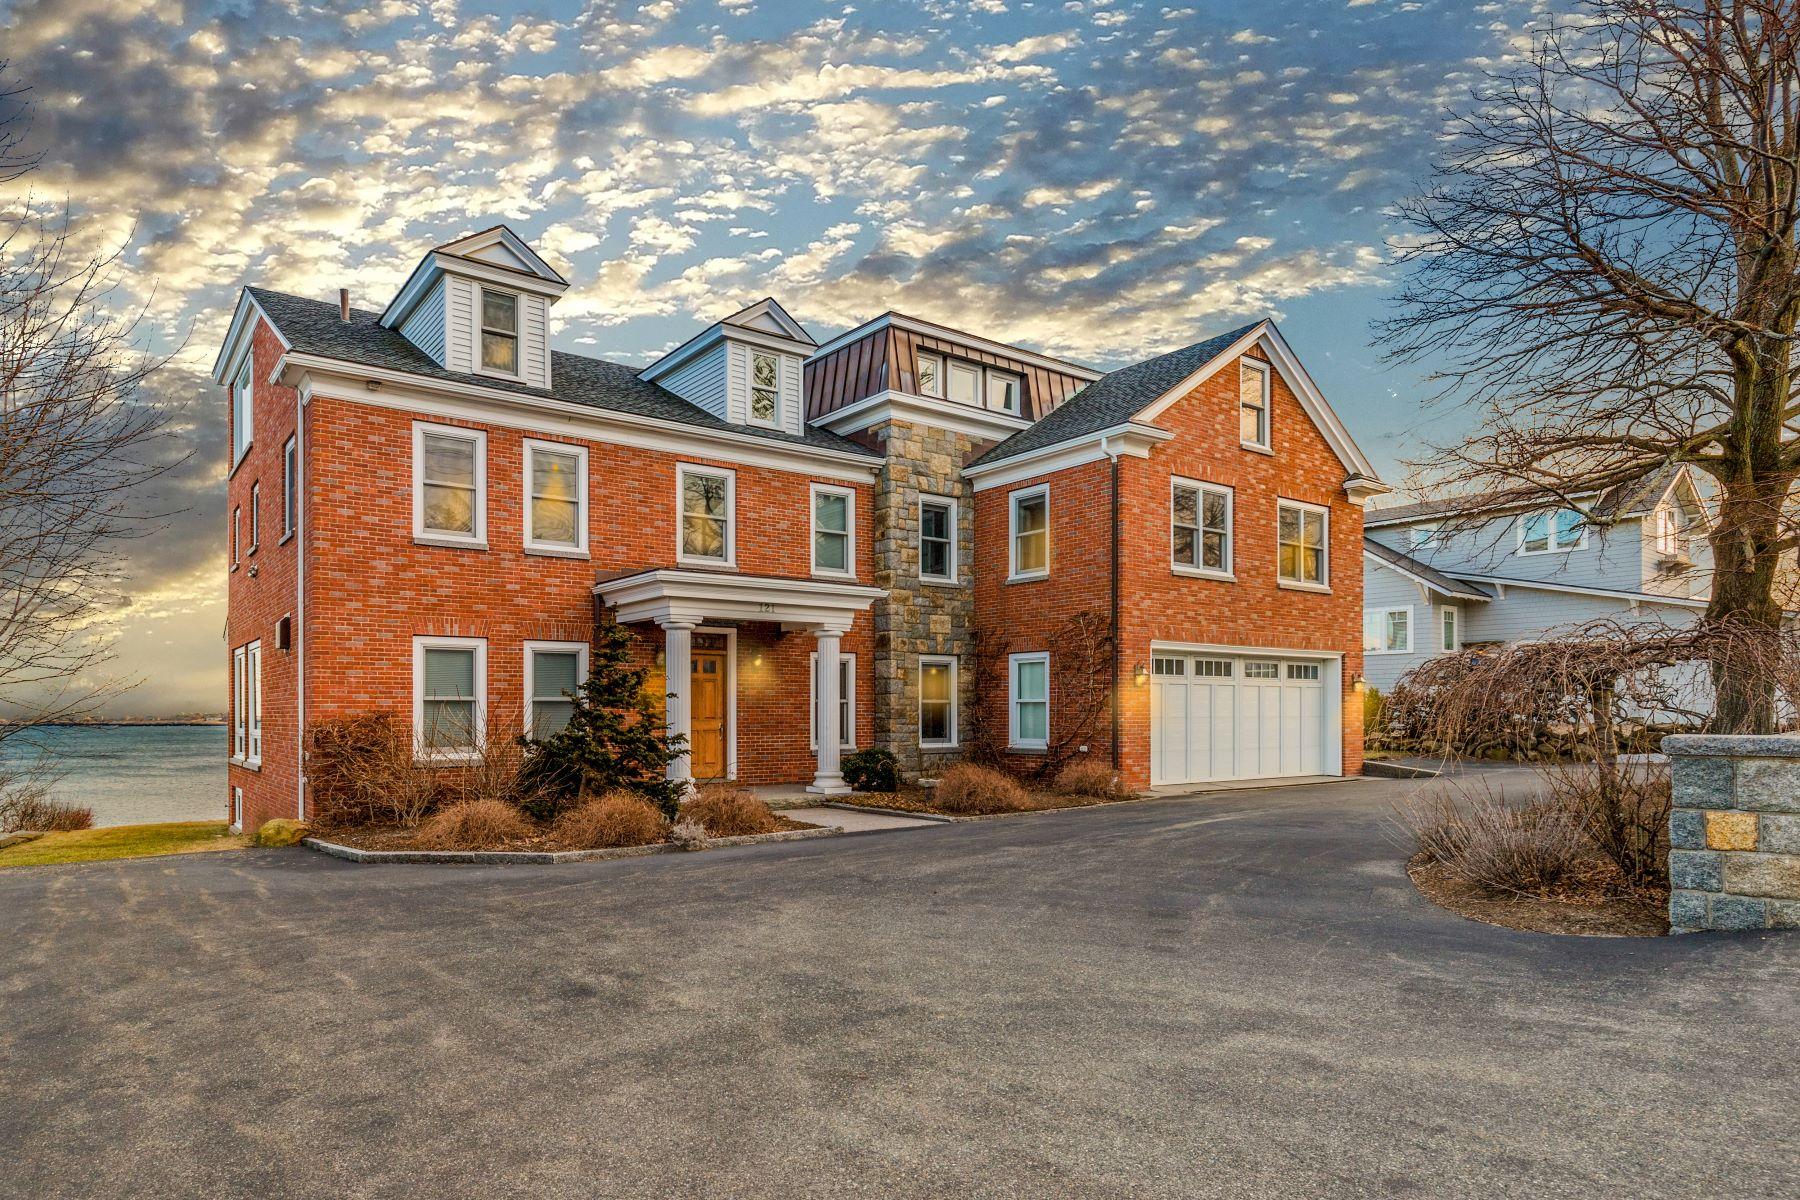 Single Family Homes 为 销售 在 121 Granite Street 罗克波特, 马萨诸塞州 01966 美国